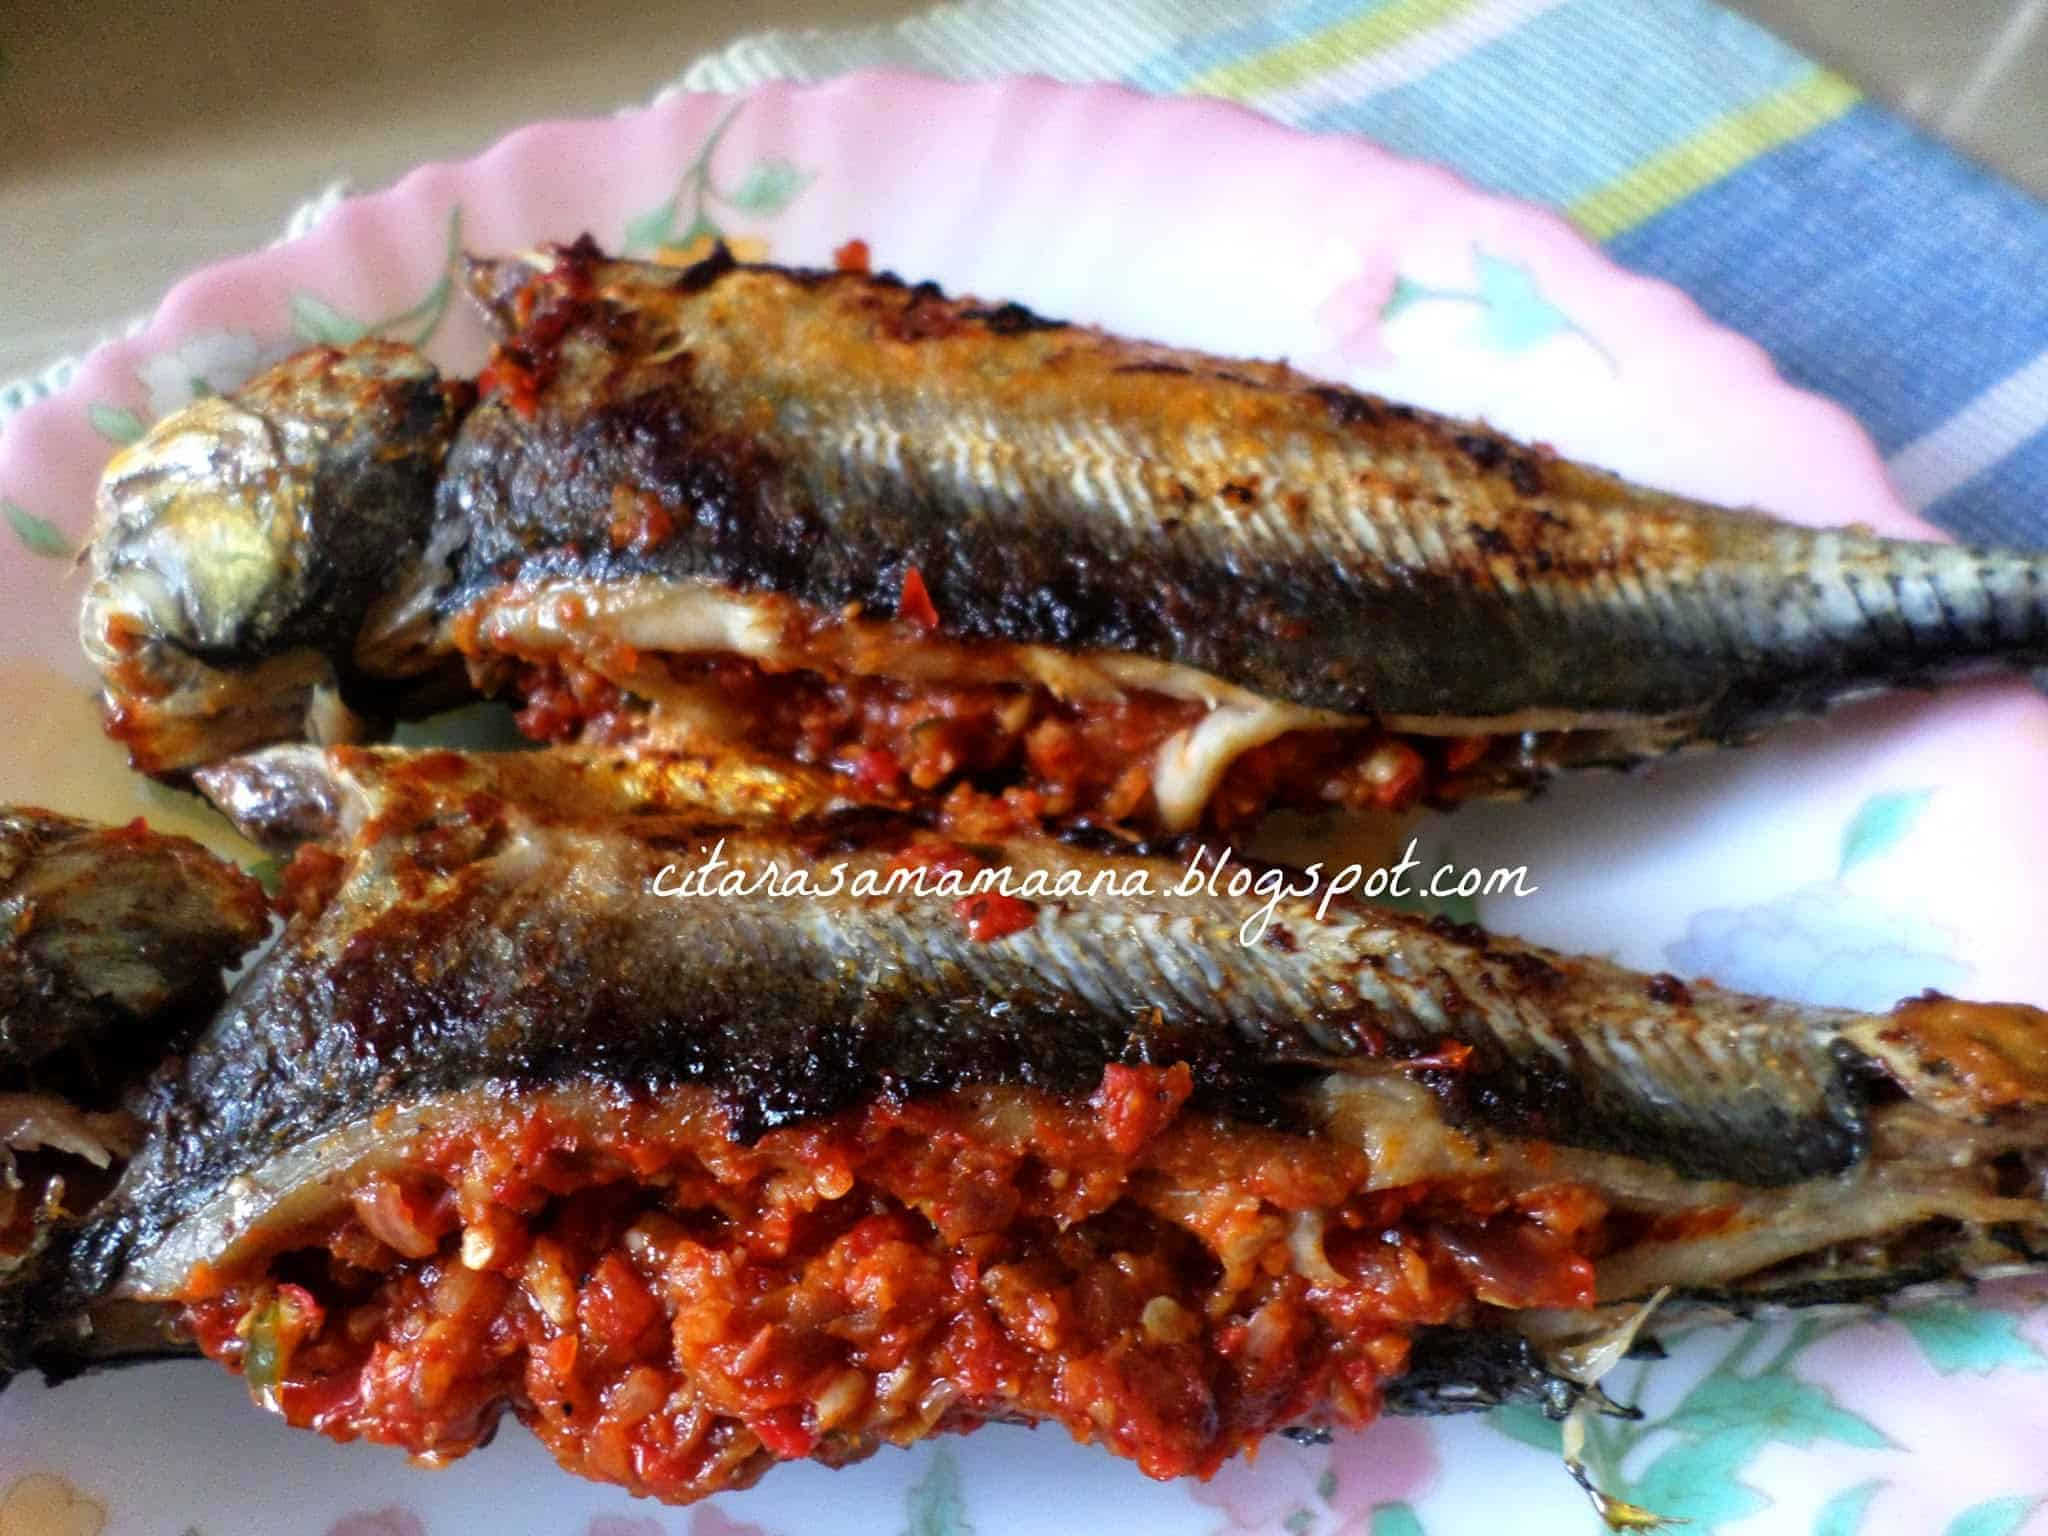 19 Resepi Masakan Kampung Yang Sedap Giler Listikelcom